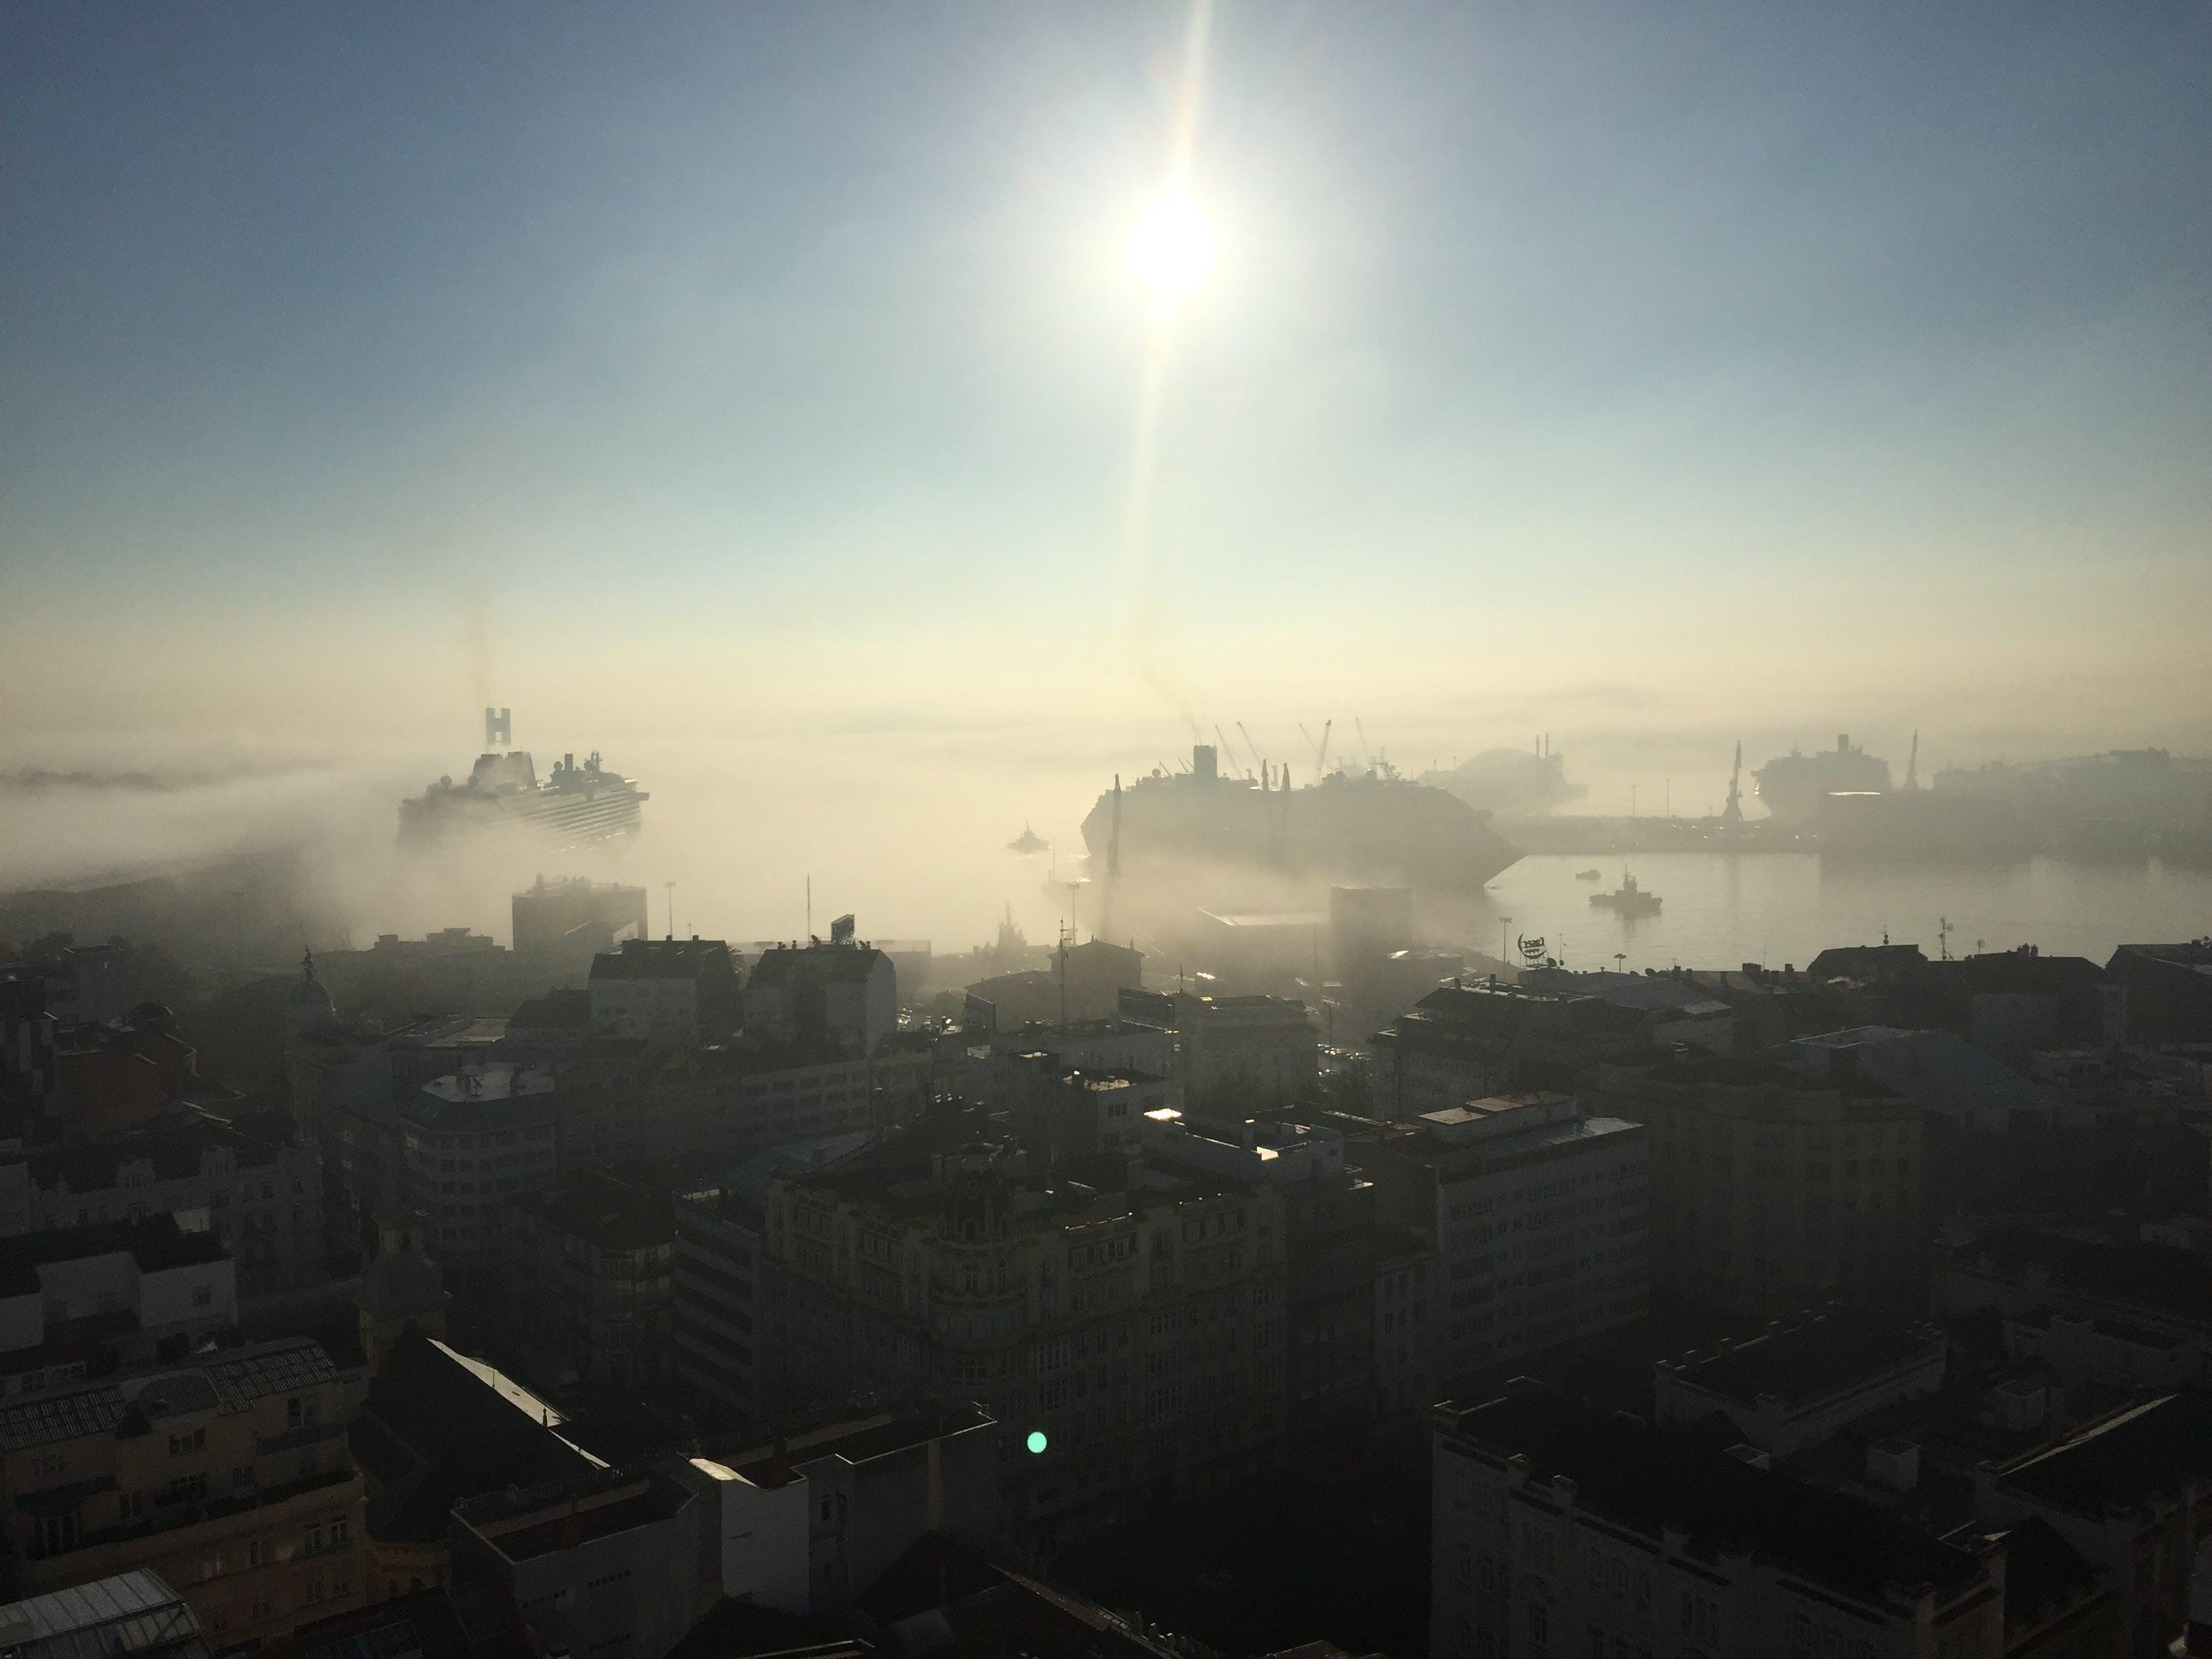 Free stock photo of city, cruise ship, frog